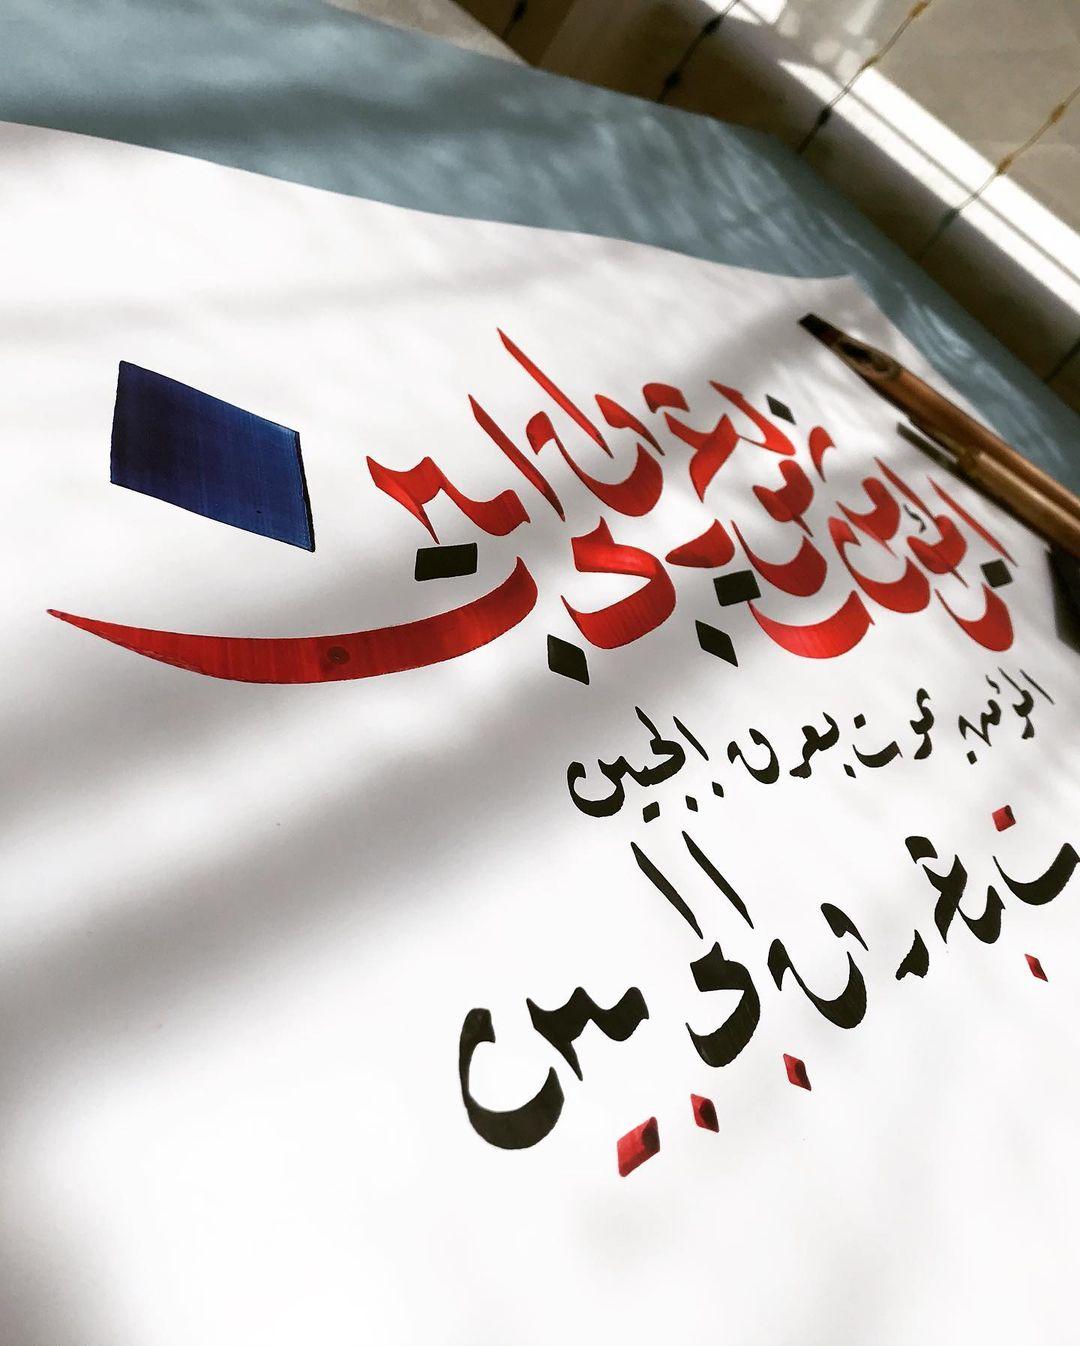 Donwload Photo المؤمن يموت بعرق الجبين #typografi #lettering #hüsnihat #kaligrafi #فن #فنون #خ...- hattat_aa 4